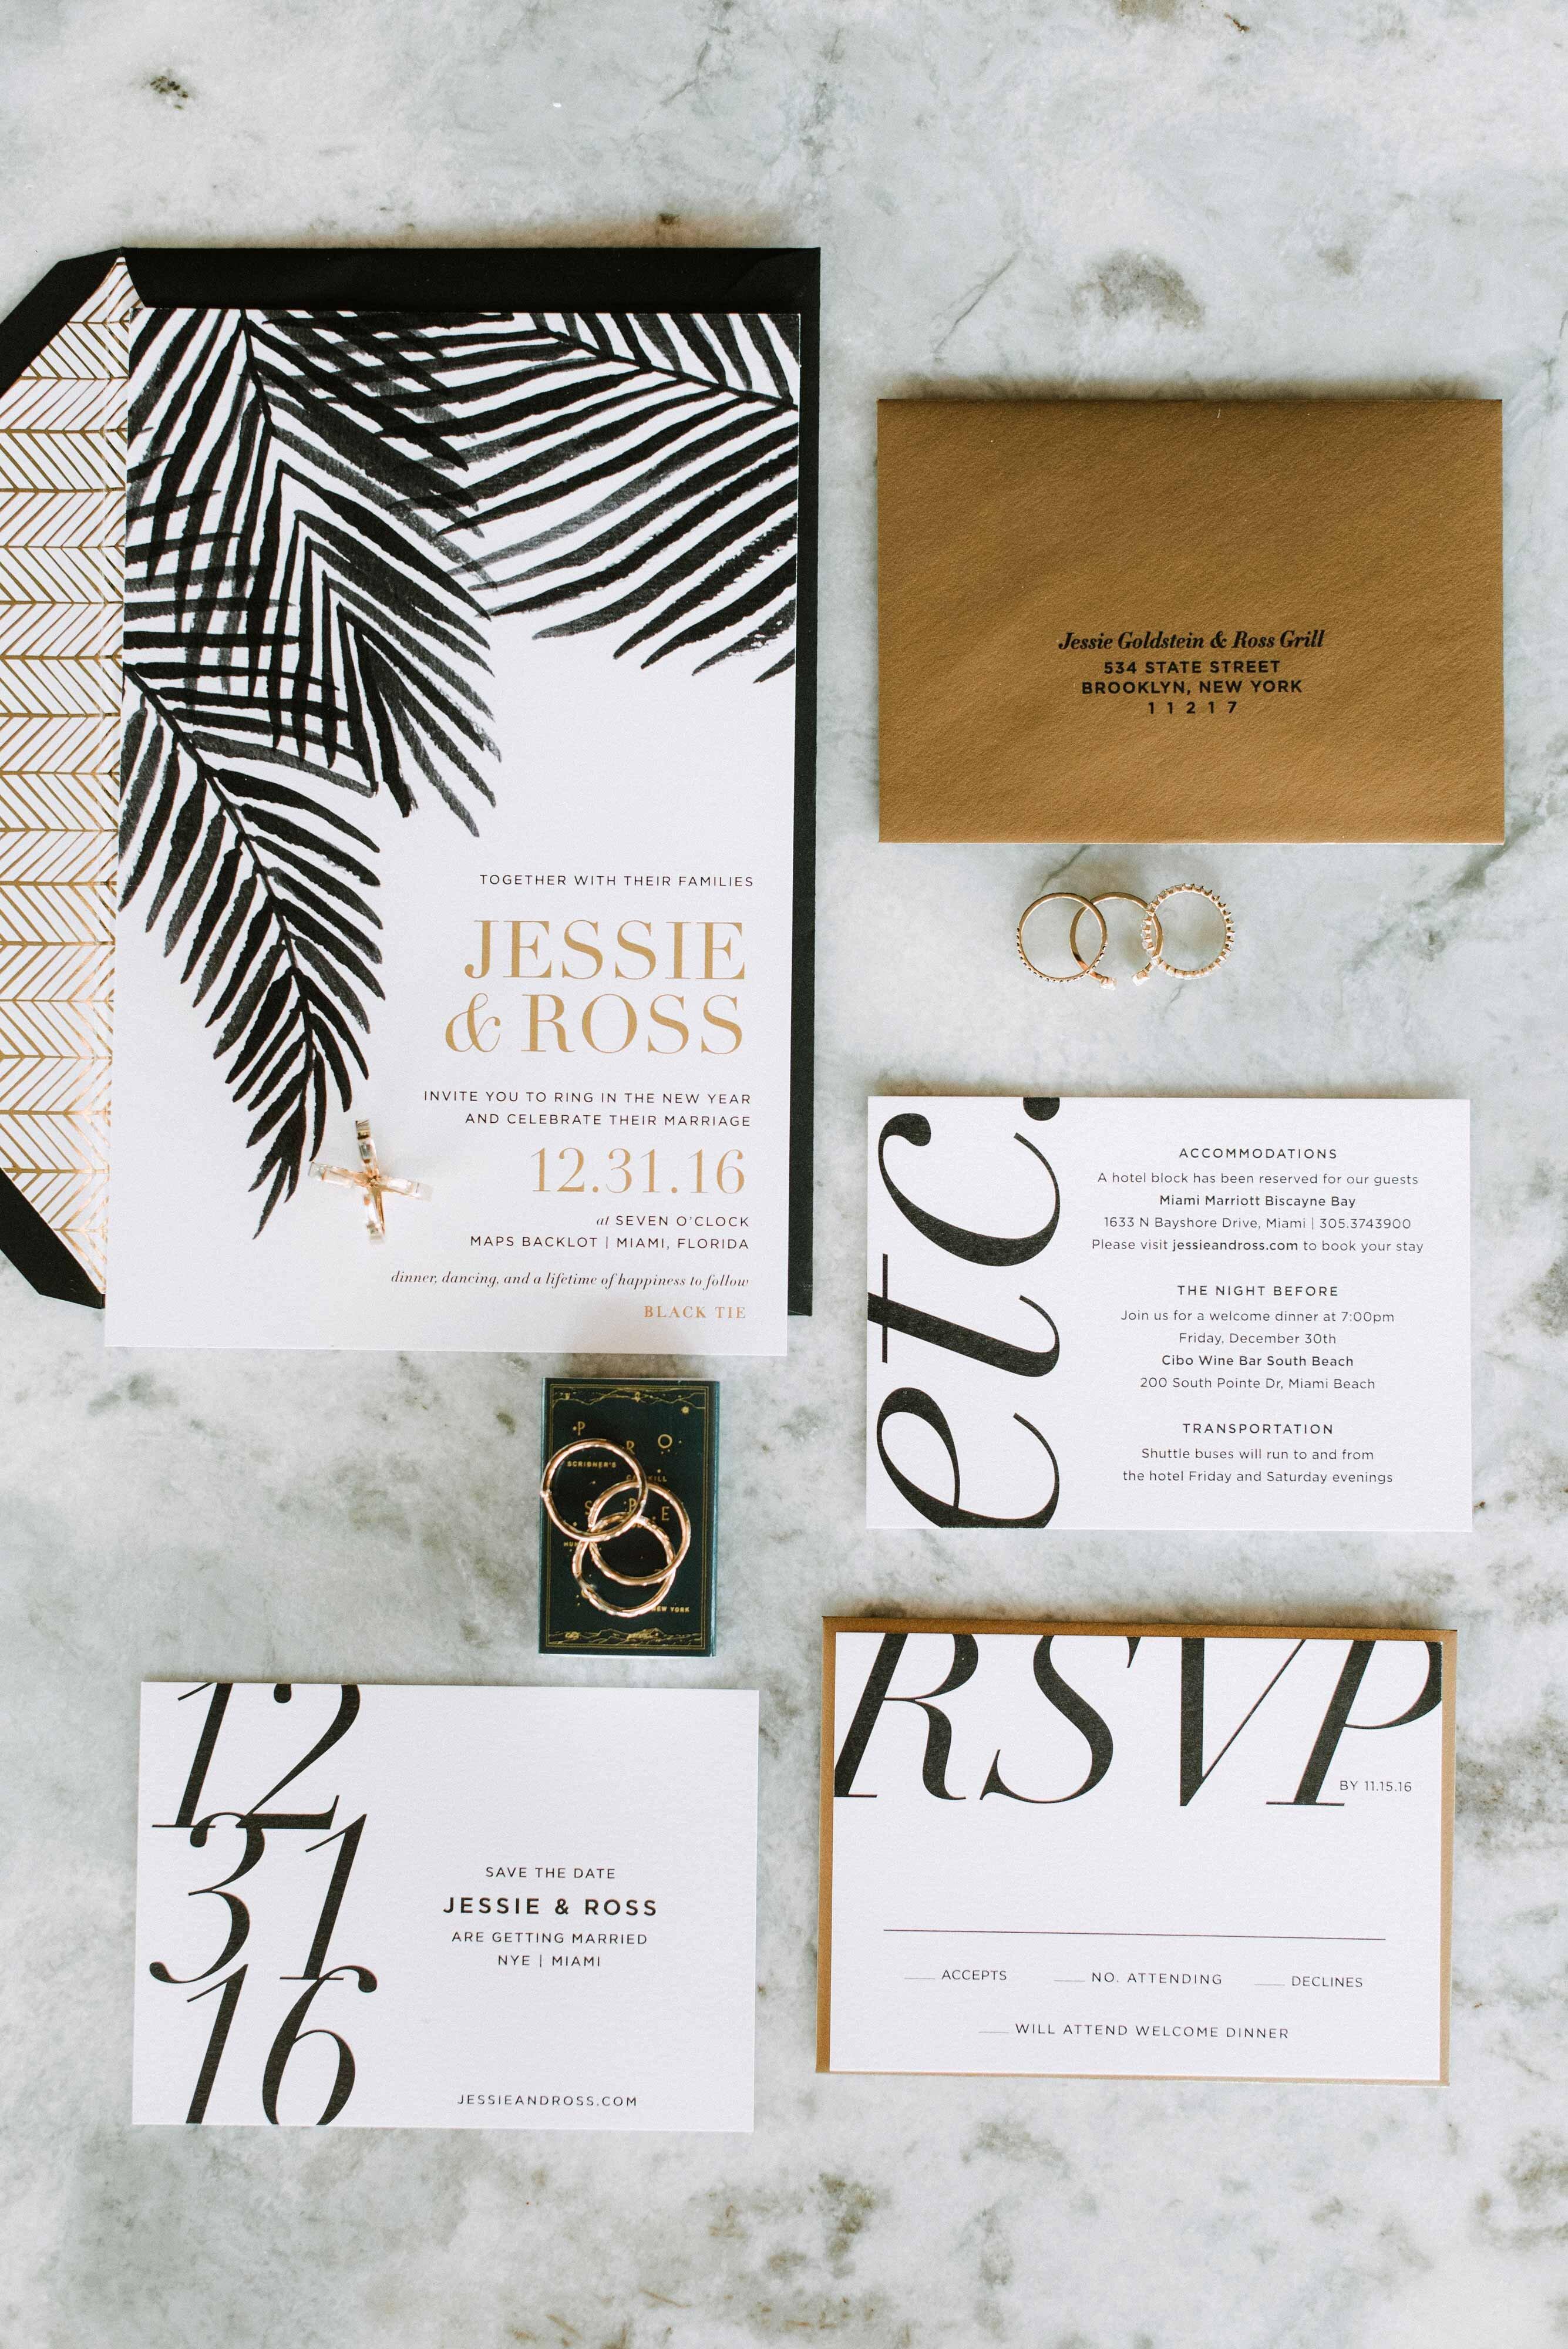 30 Modern Wedding Invitations We Love | Martha Stewart Weddings